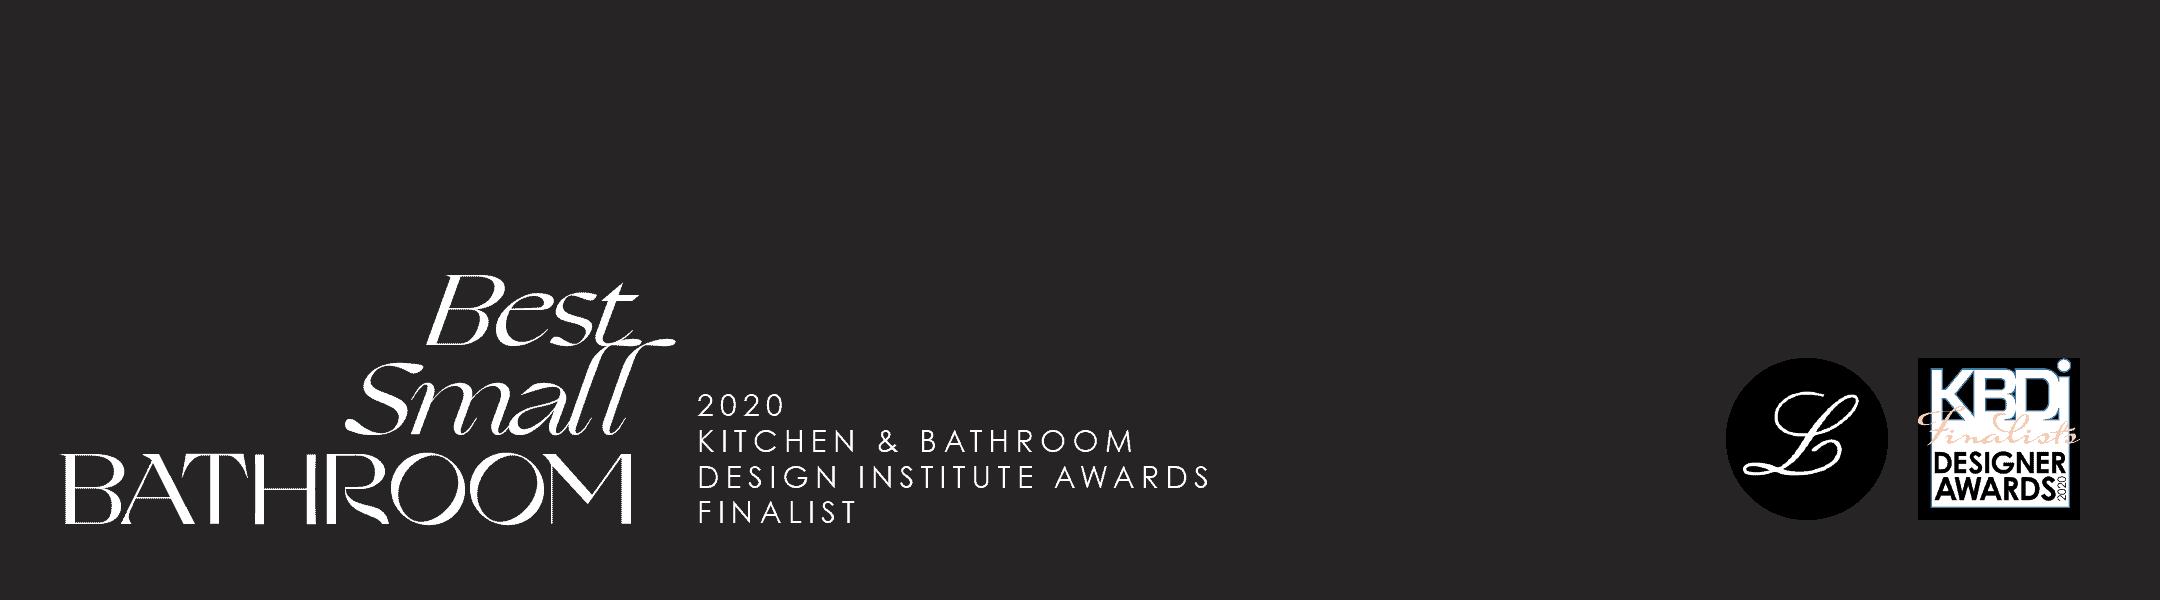 KBDi Award - Best Small Bathroom